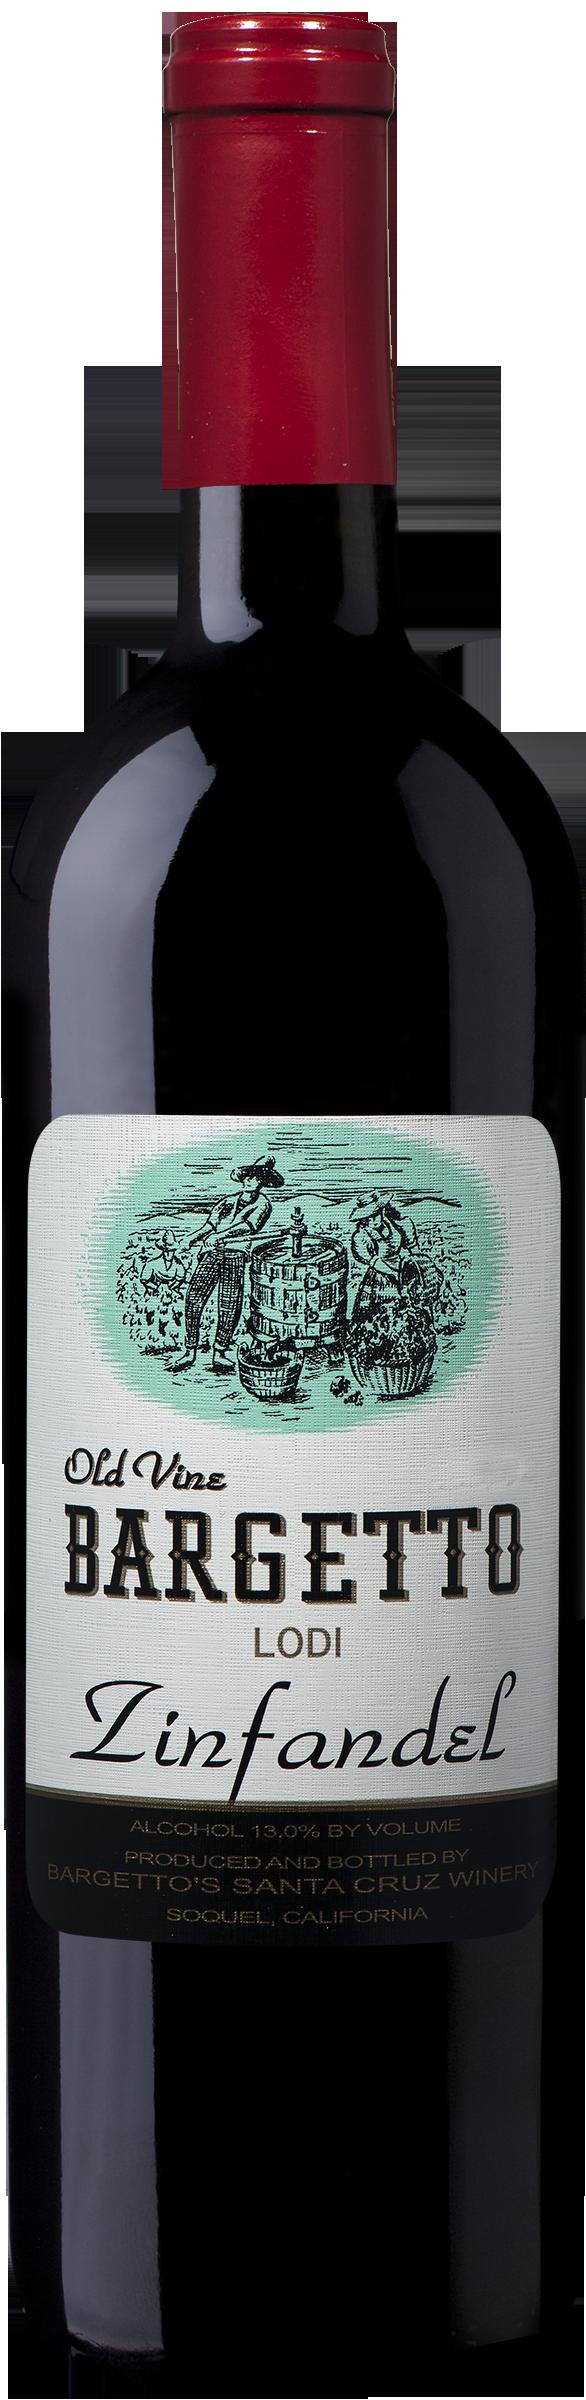 Drinking clipart vintage wine bottle. Trade media notes shelf